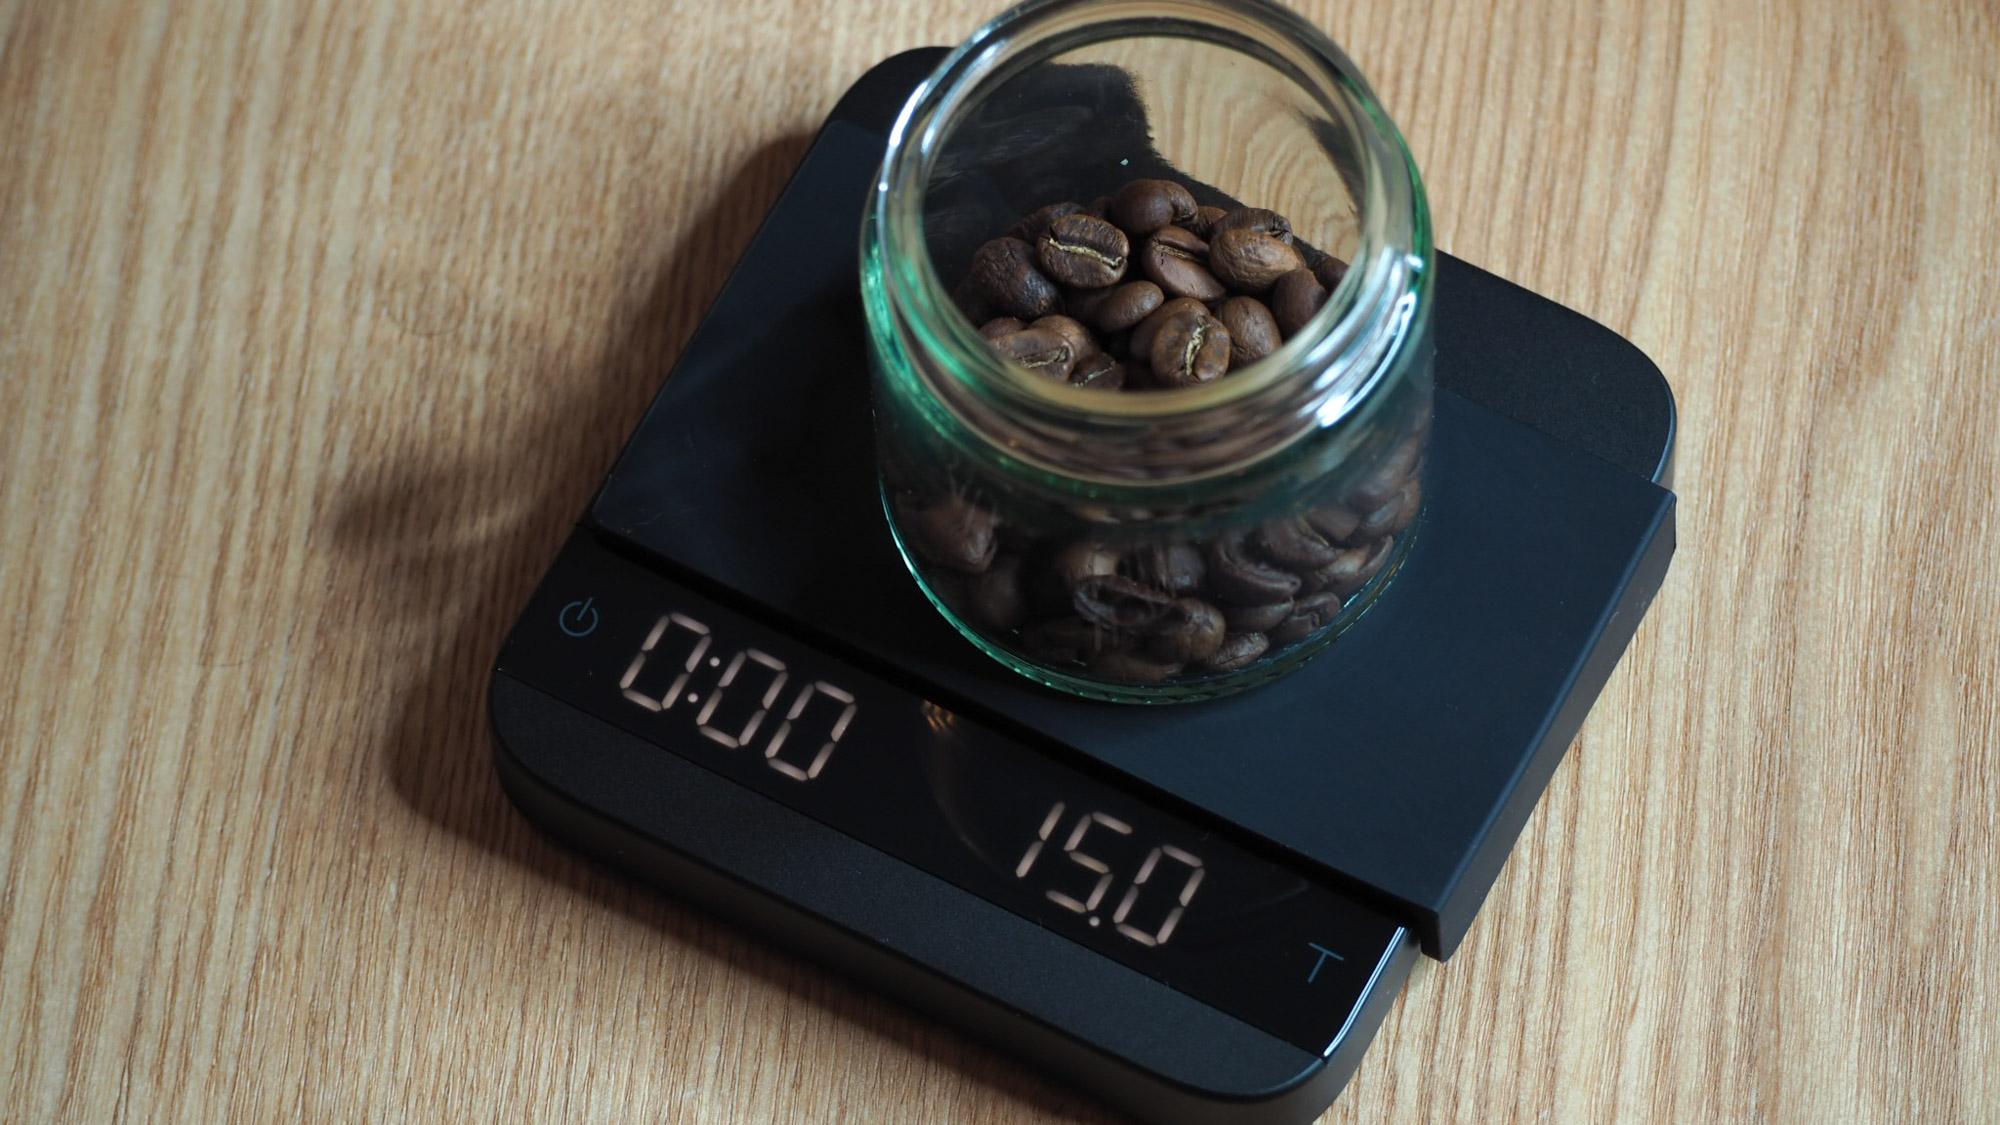 acaia lunar coffee scale